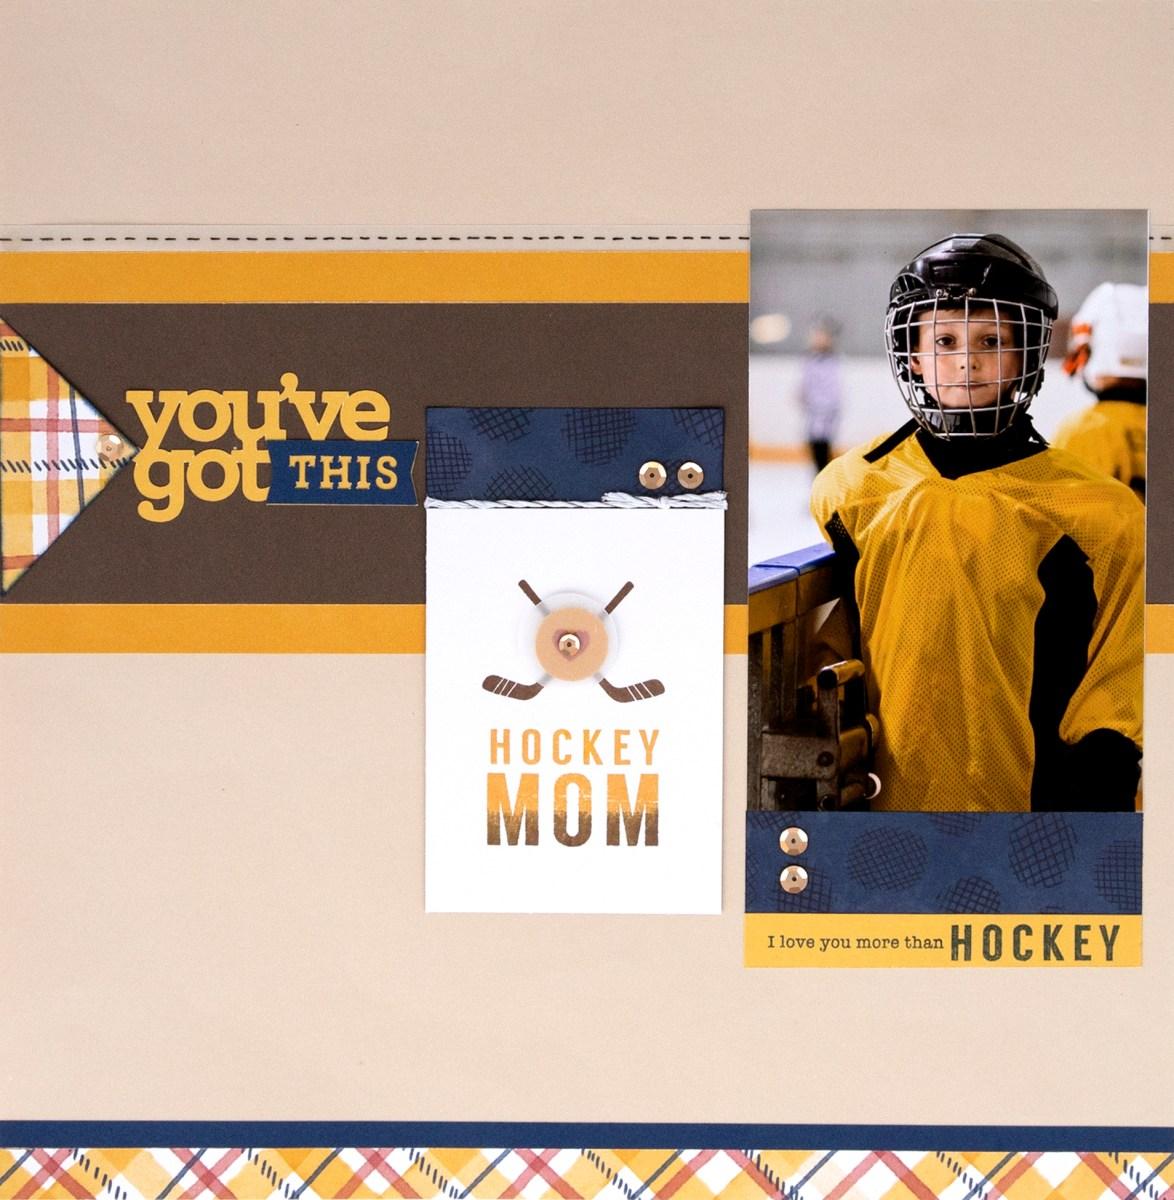 True North Workshop #ctmh #closetomyheart #TrueNorth #TrueNorthWorkshop #CelebrateCanada #Canada #hockey #icechockey